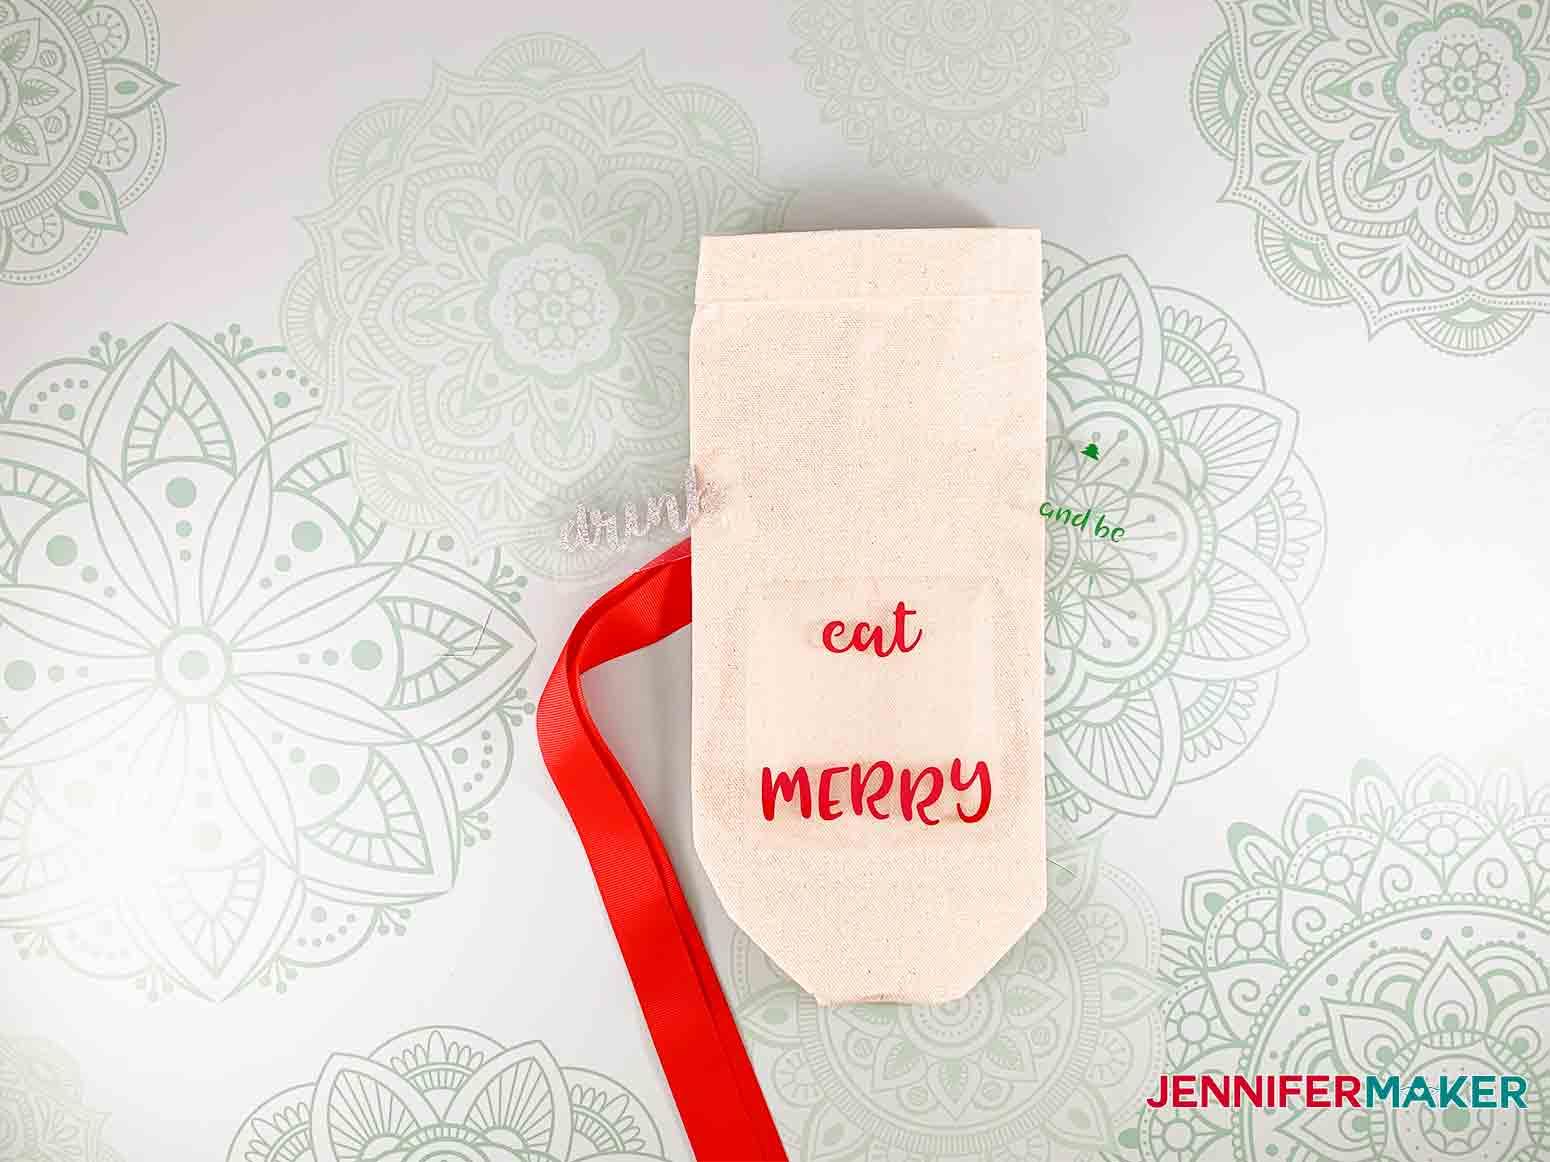 Festive-Holiday-Wine-Totes-JenniferMaker-add-svg-Iron-on-vinyl